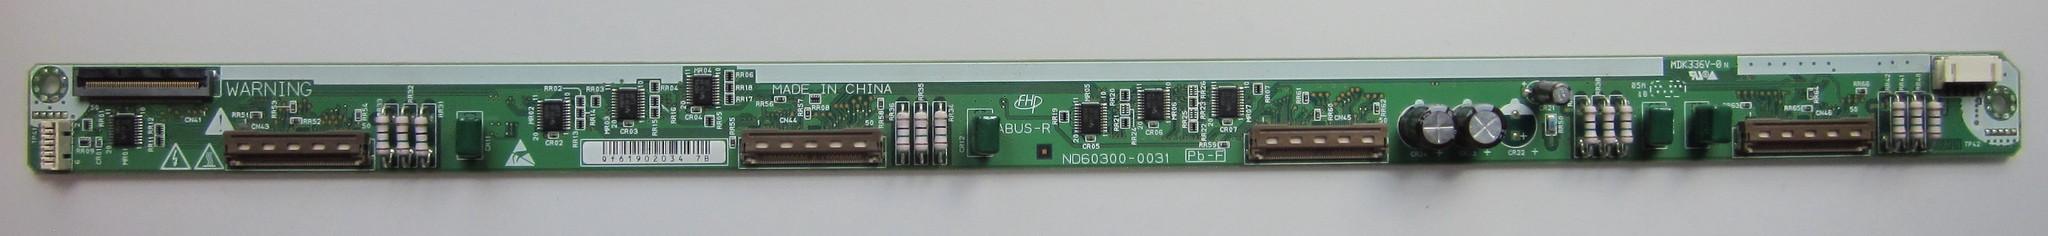 ND60300-0031